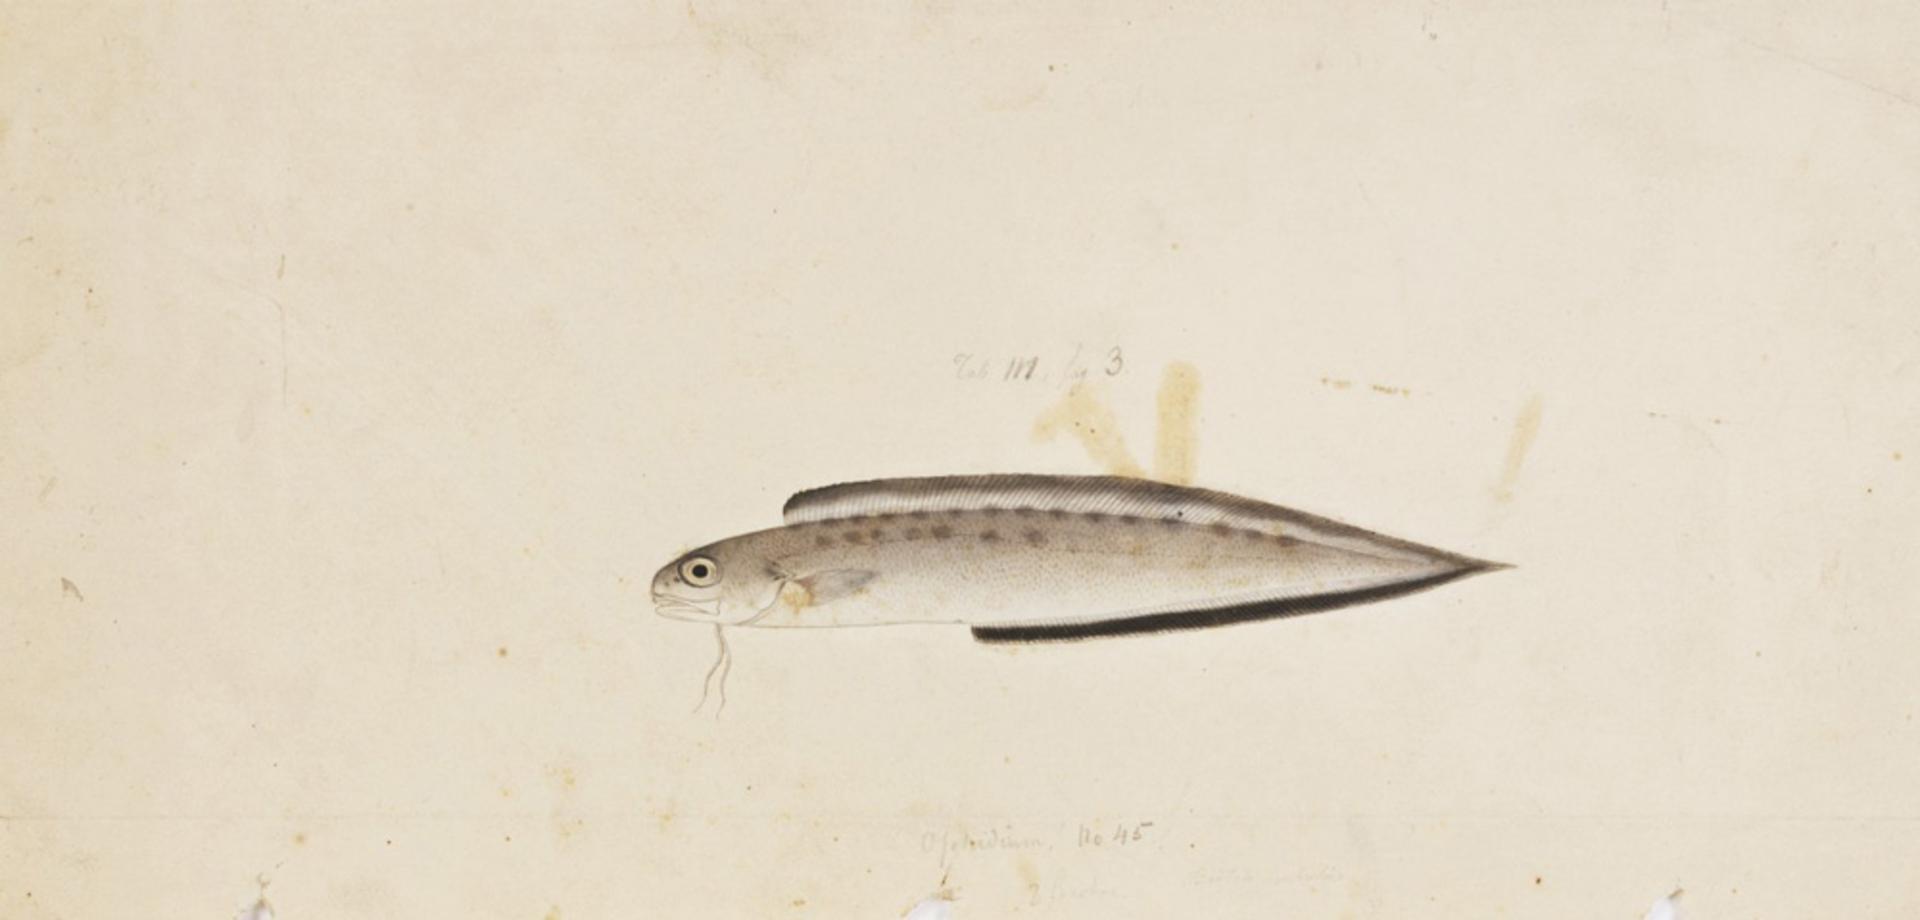 RMNH.ART.156 | Sirembo imberbis